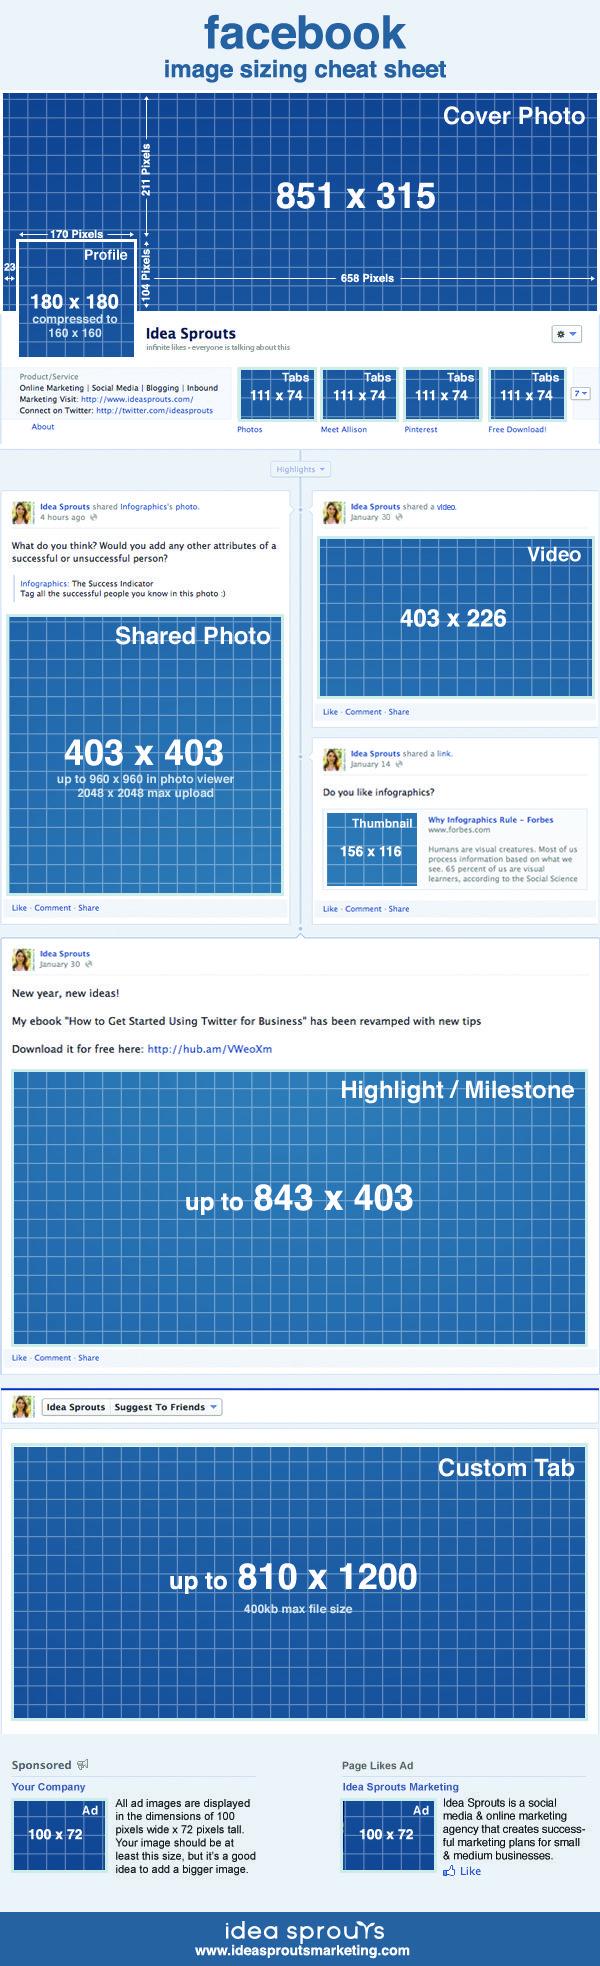 Facebook Images Sizes | Facebook | Pinterest | Facebook image sizes